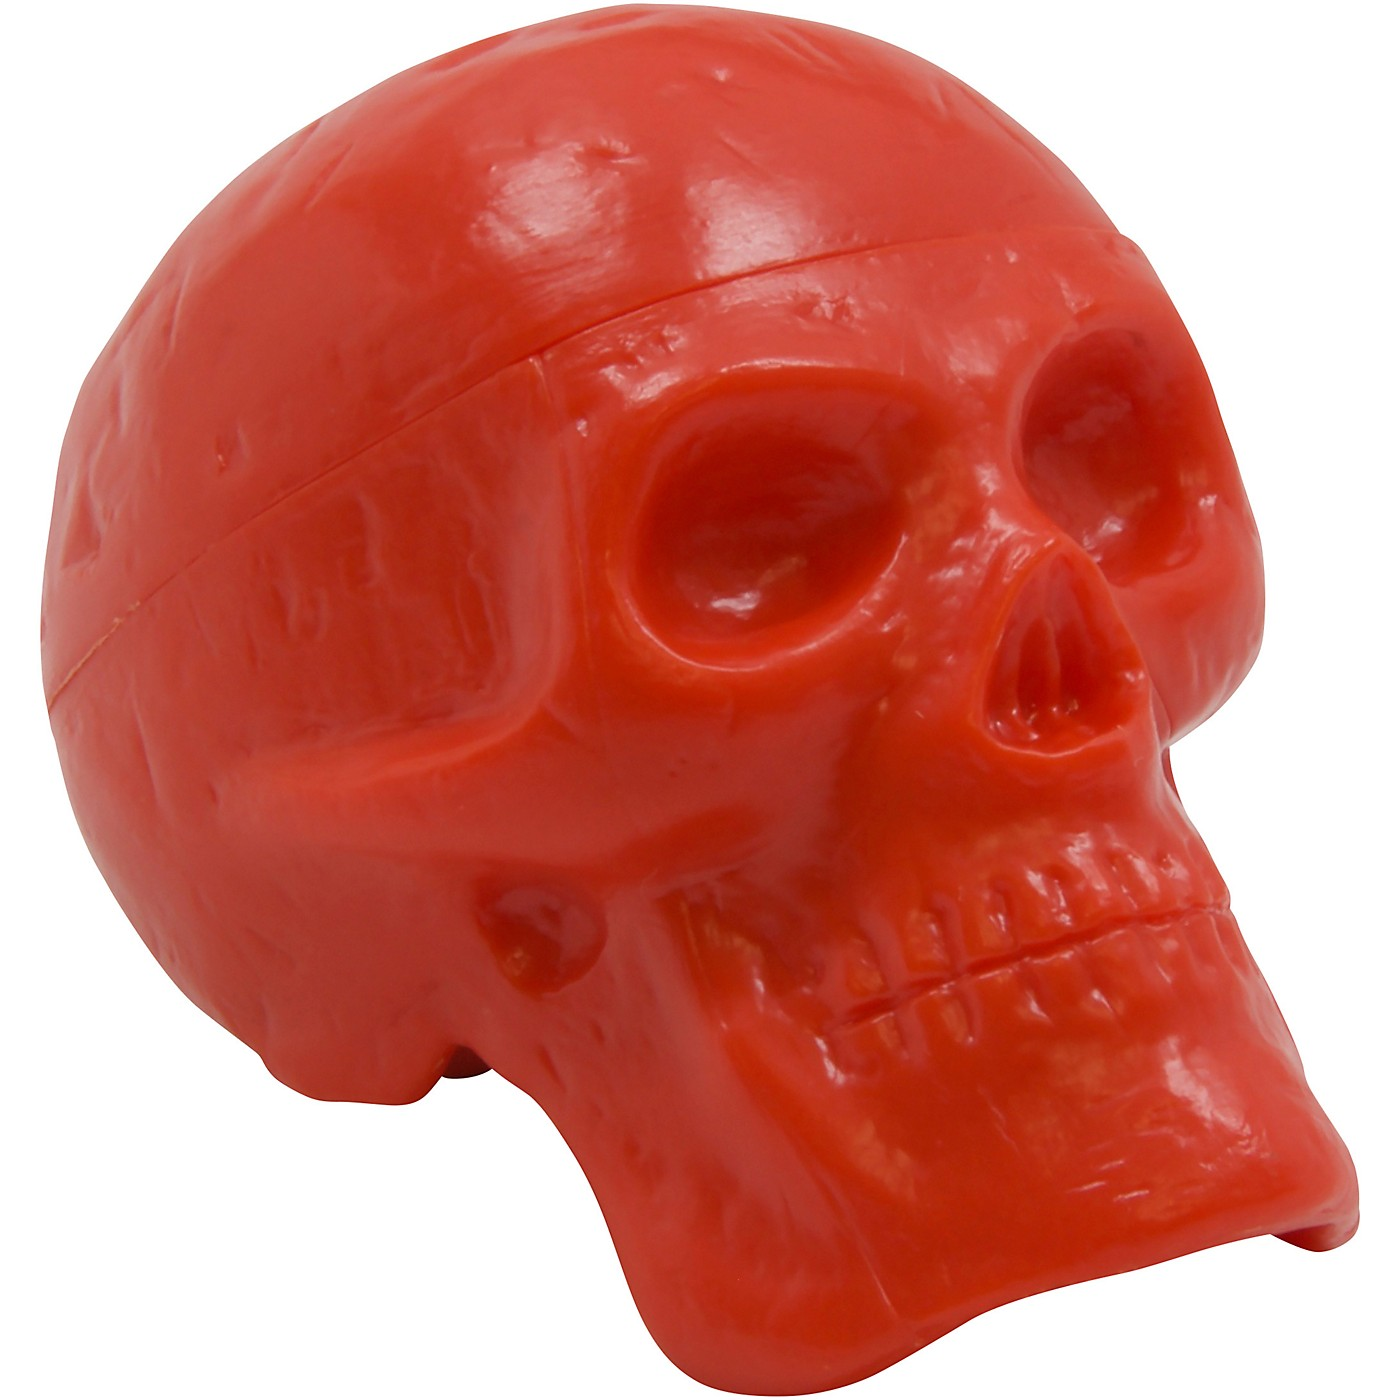 Trophy Beadbrain Skull Rhythm Shaker thumbnail